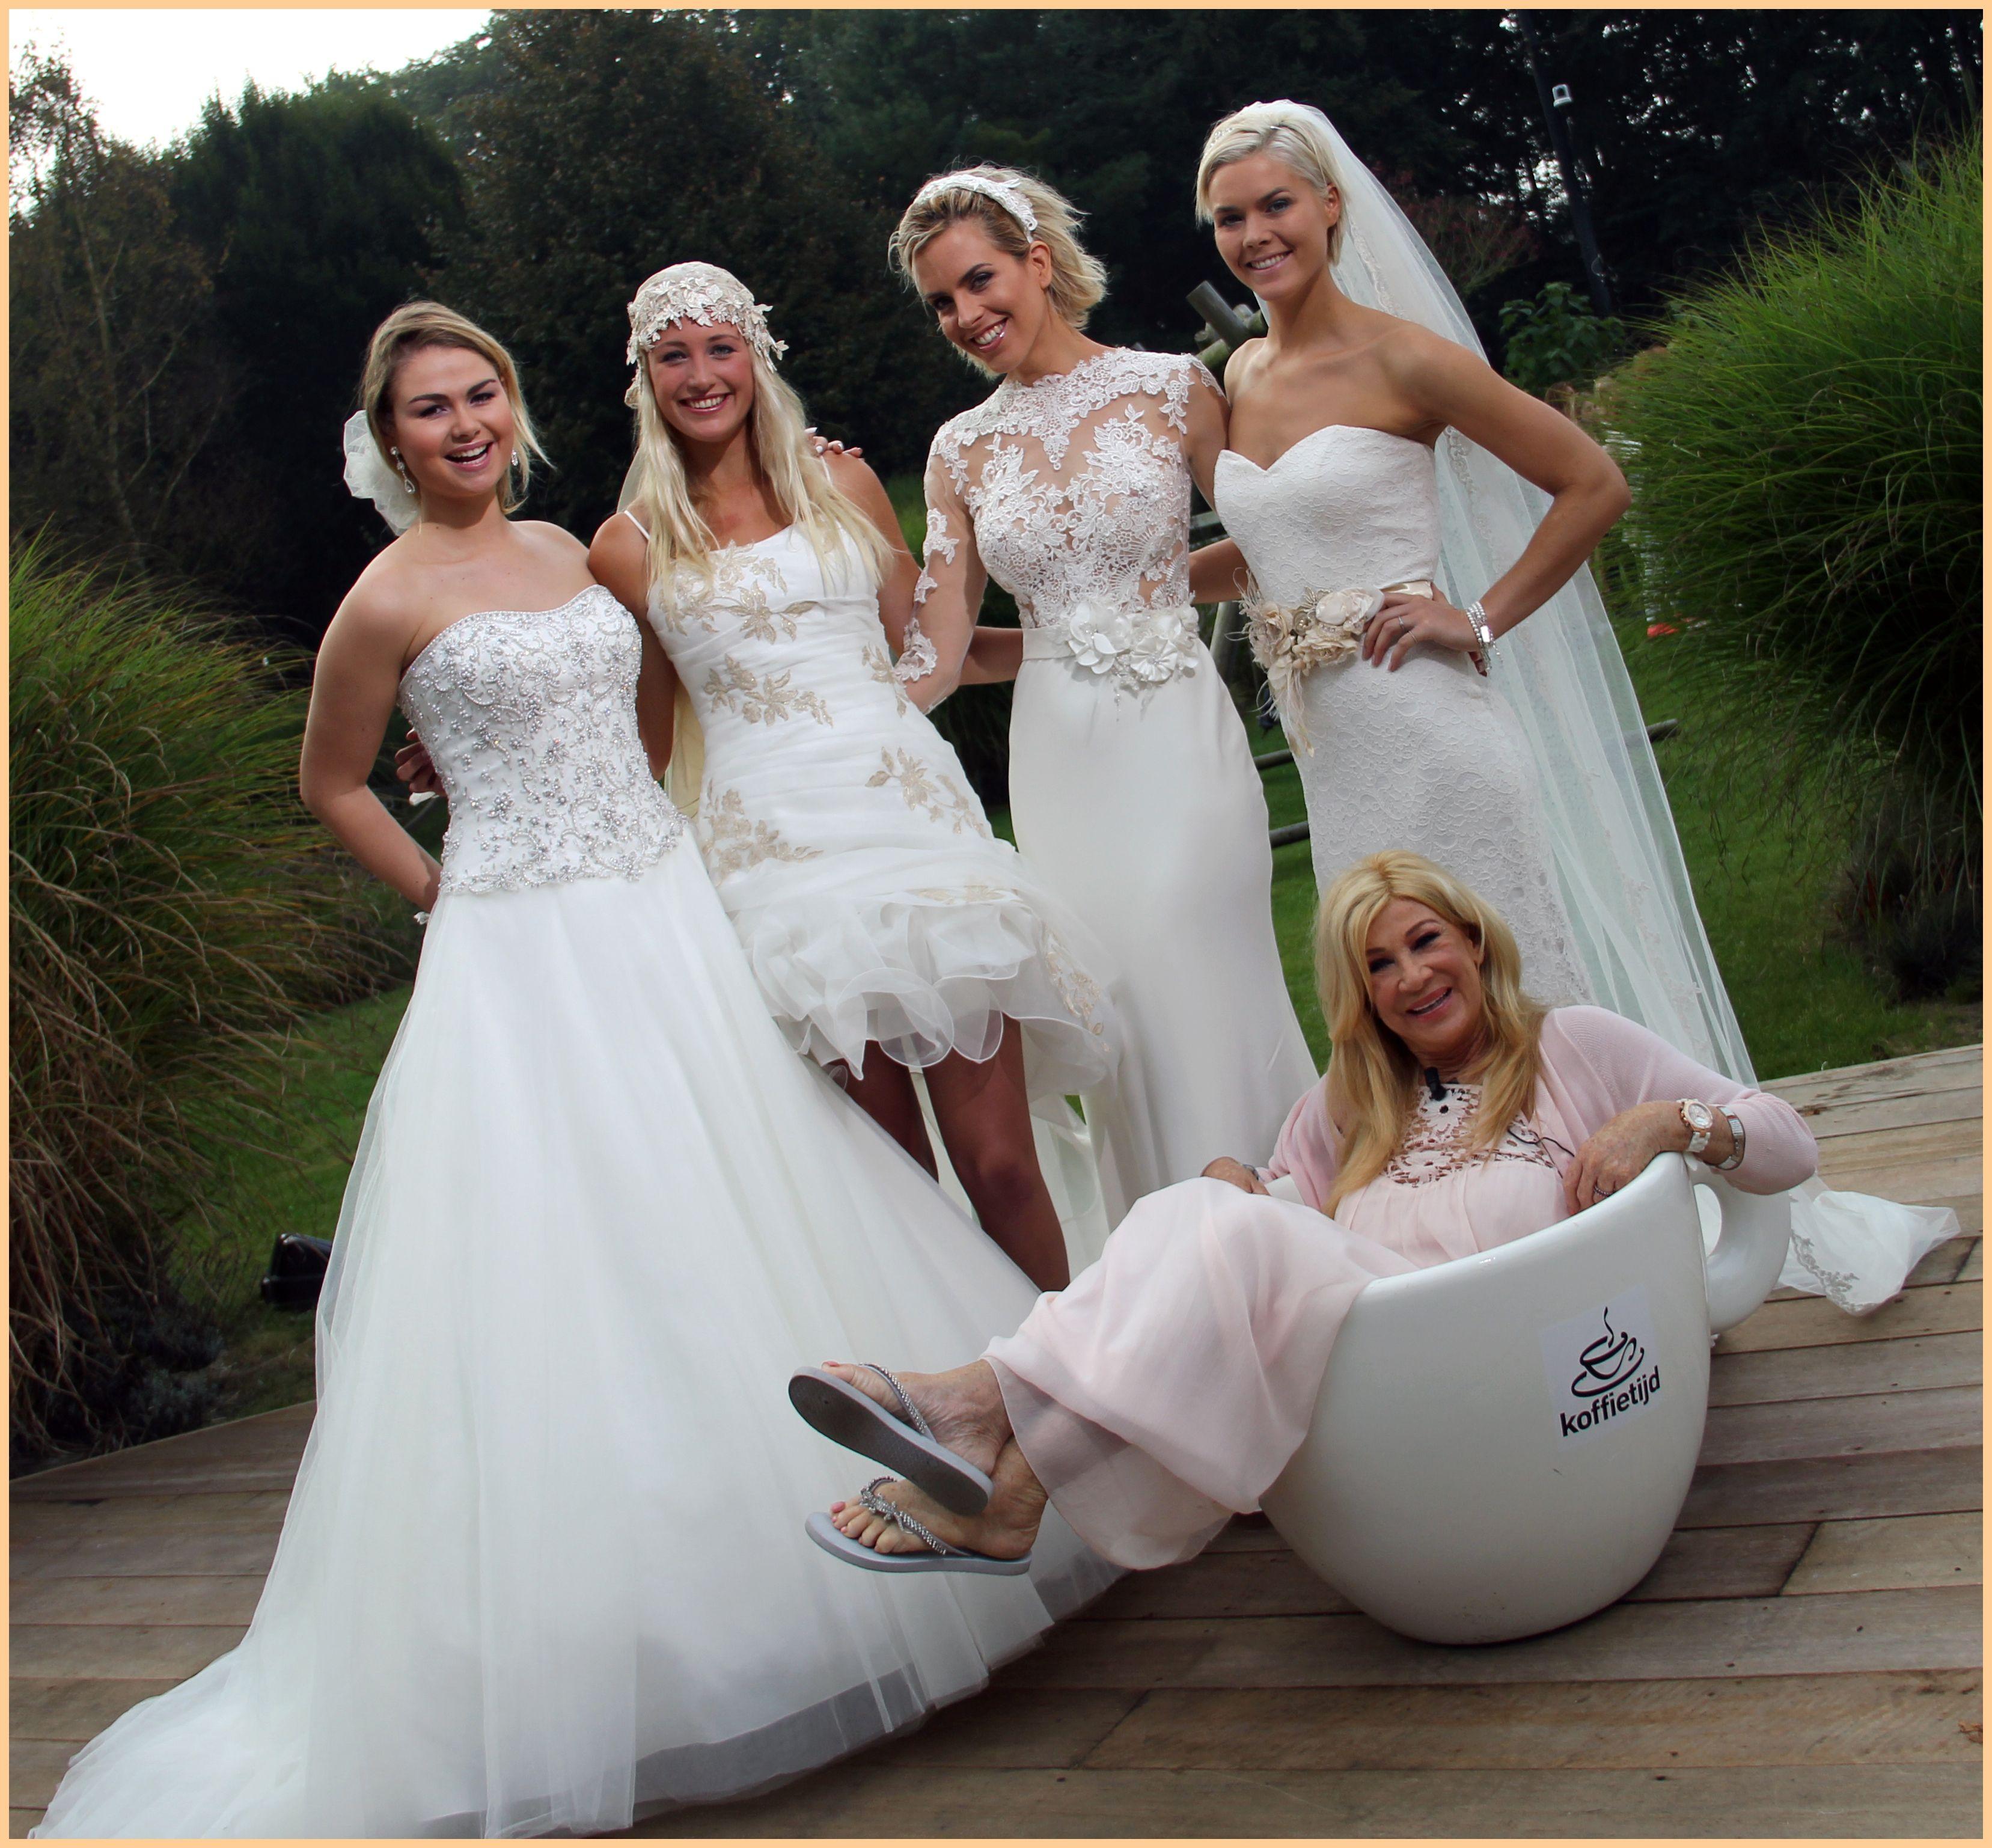 Trouwjurk Borsato.Mary Borsato Gasten De Koffietijdkop Wedding Dresses Wedding